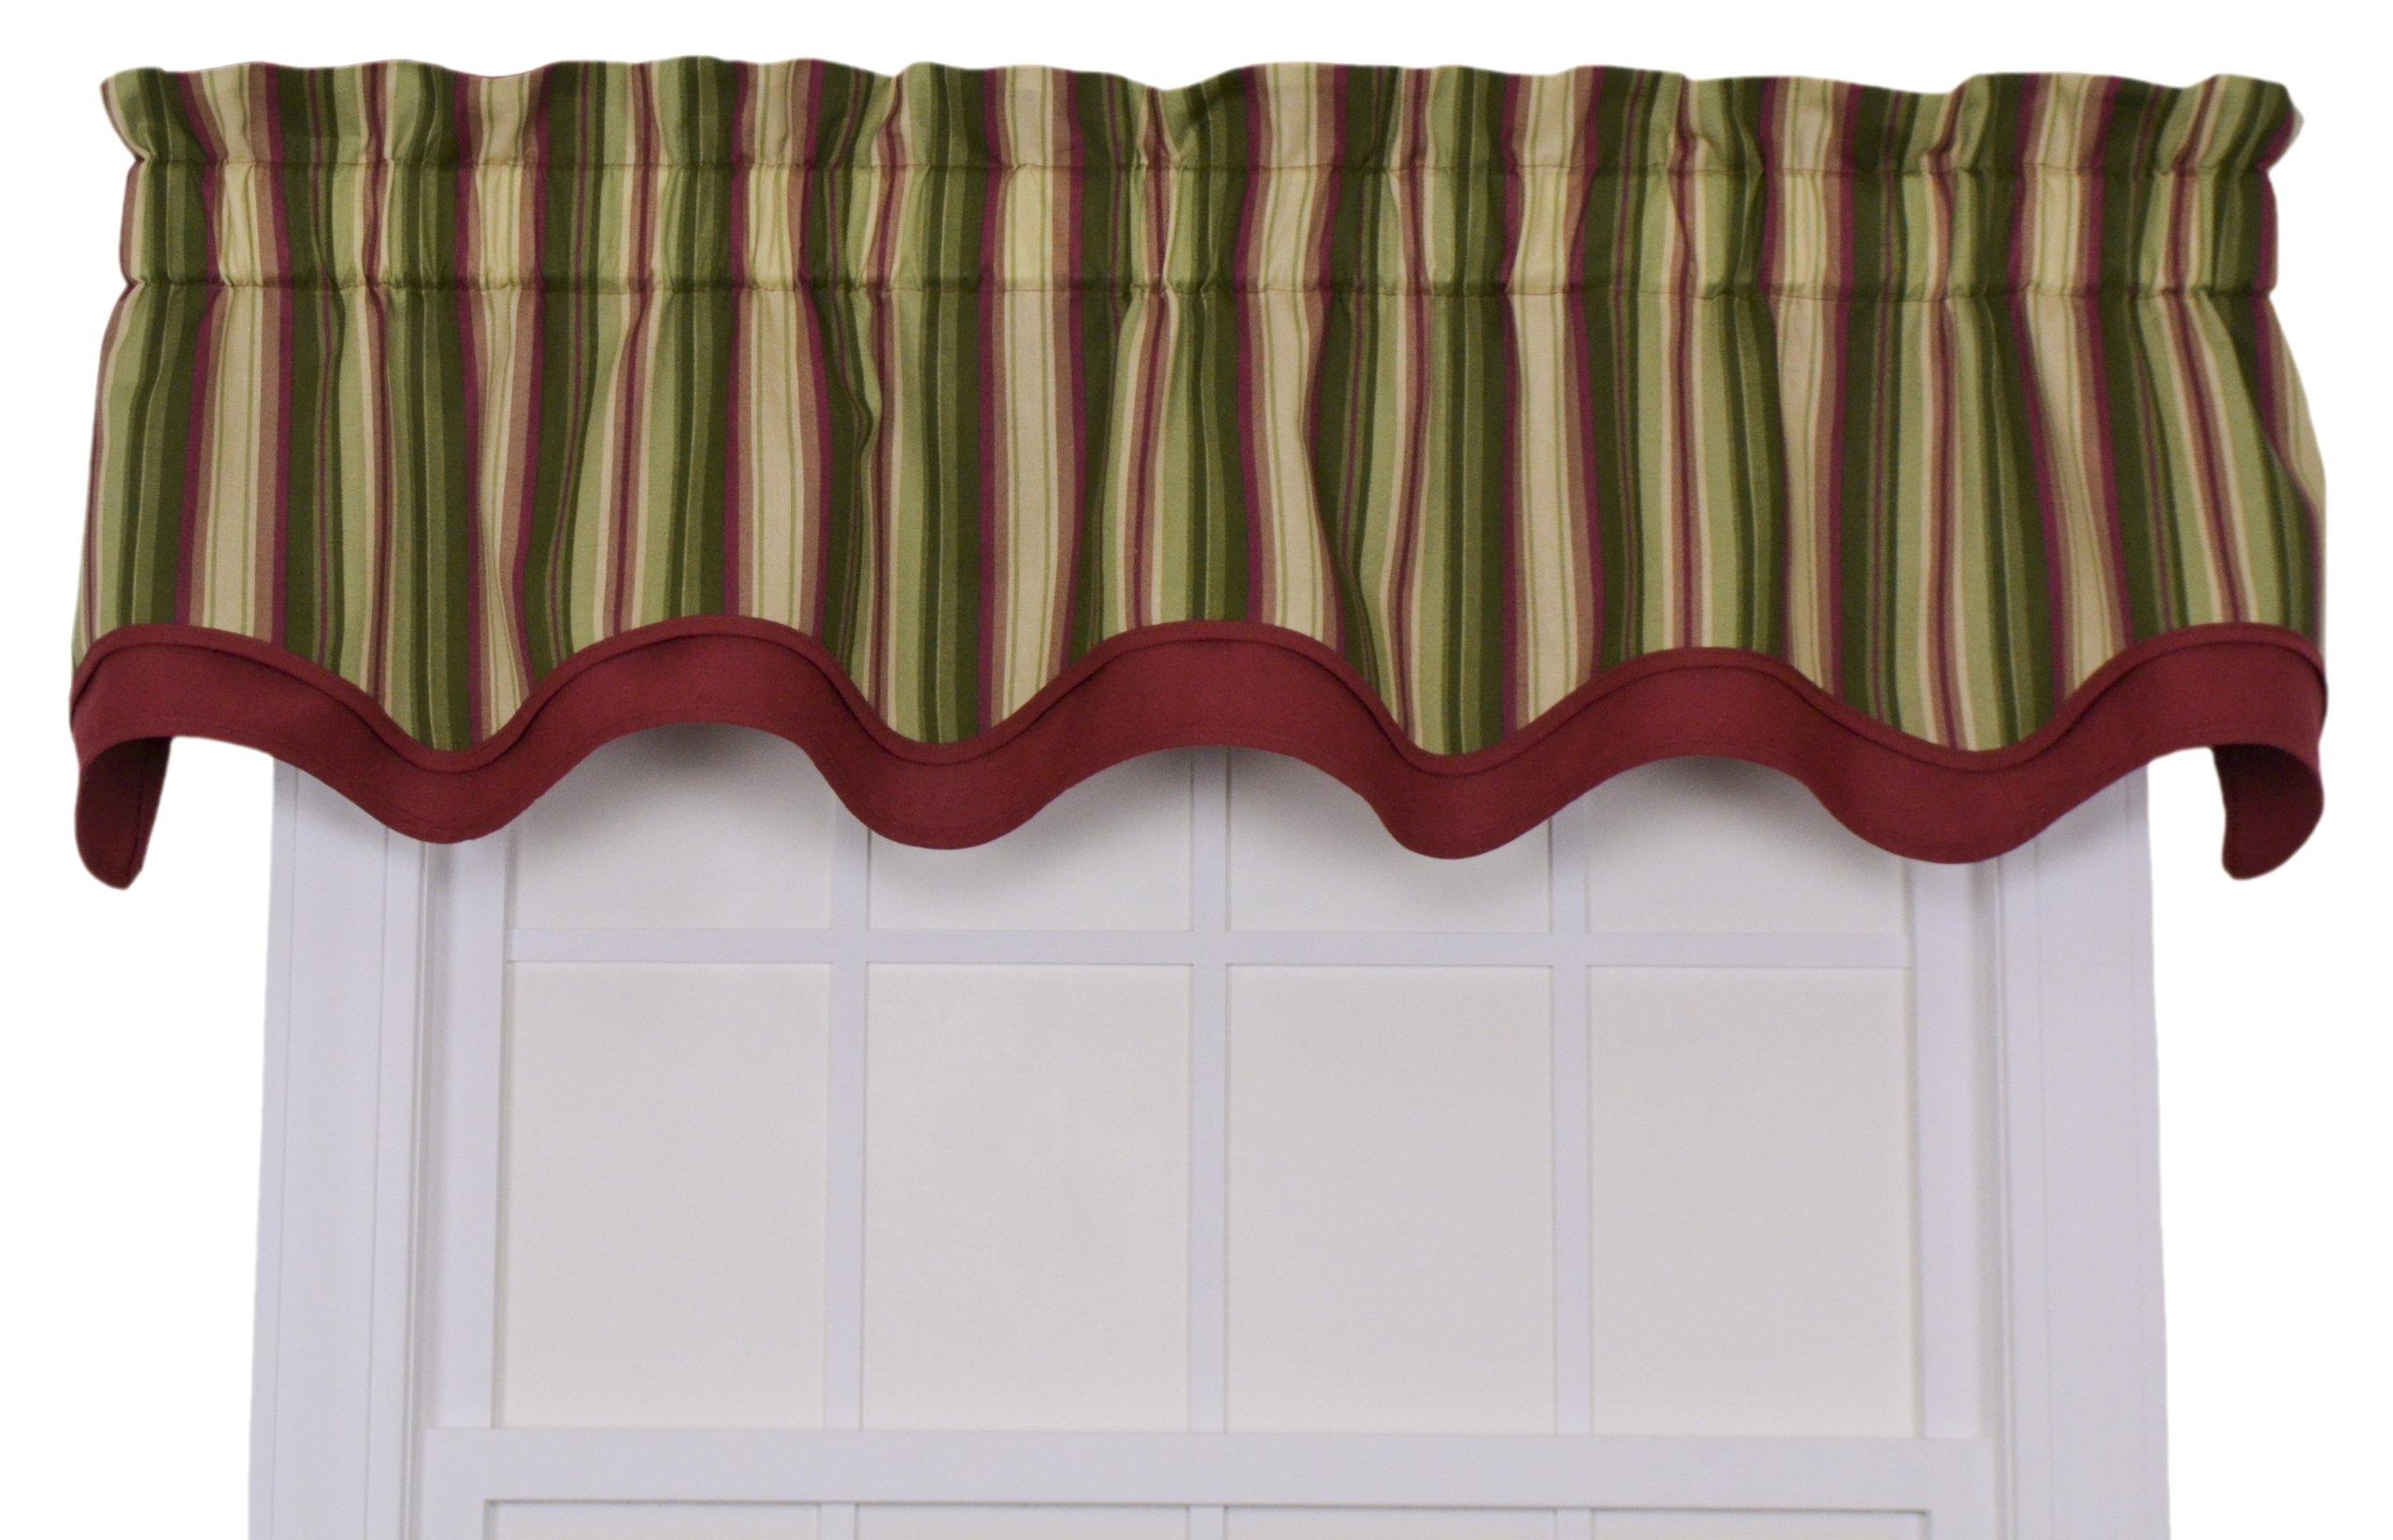 Striped valance curtains